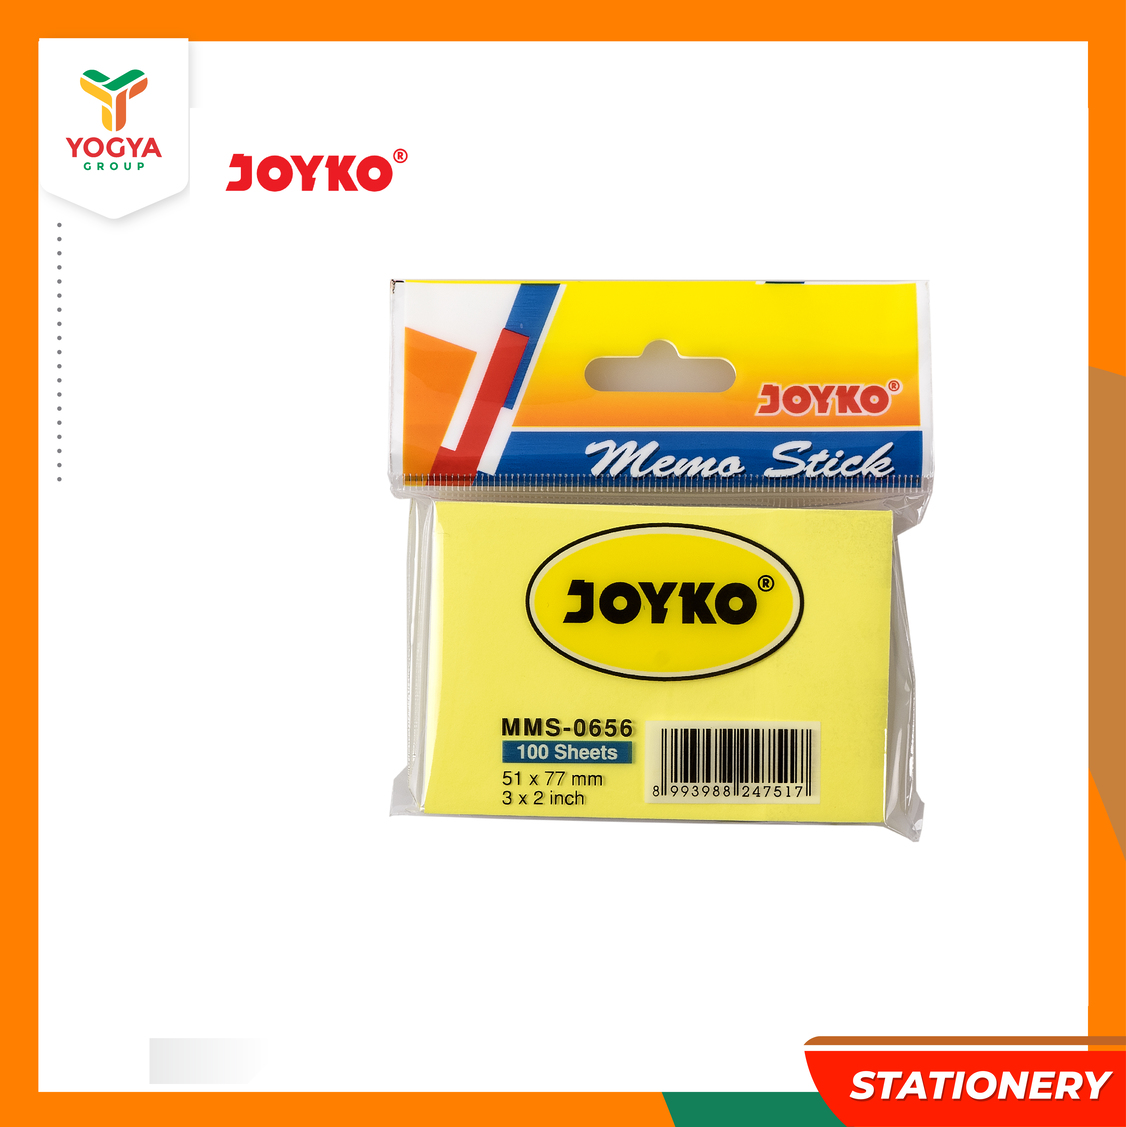 JOYKO MEMO STICK MMS 0656 P